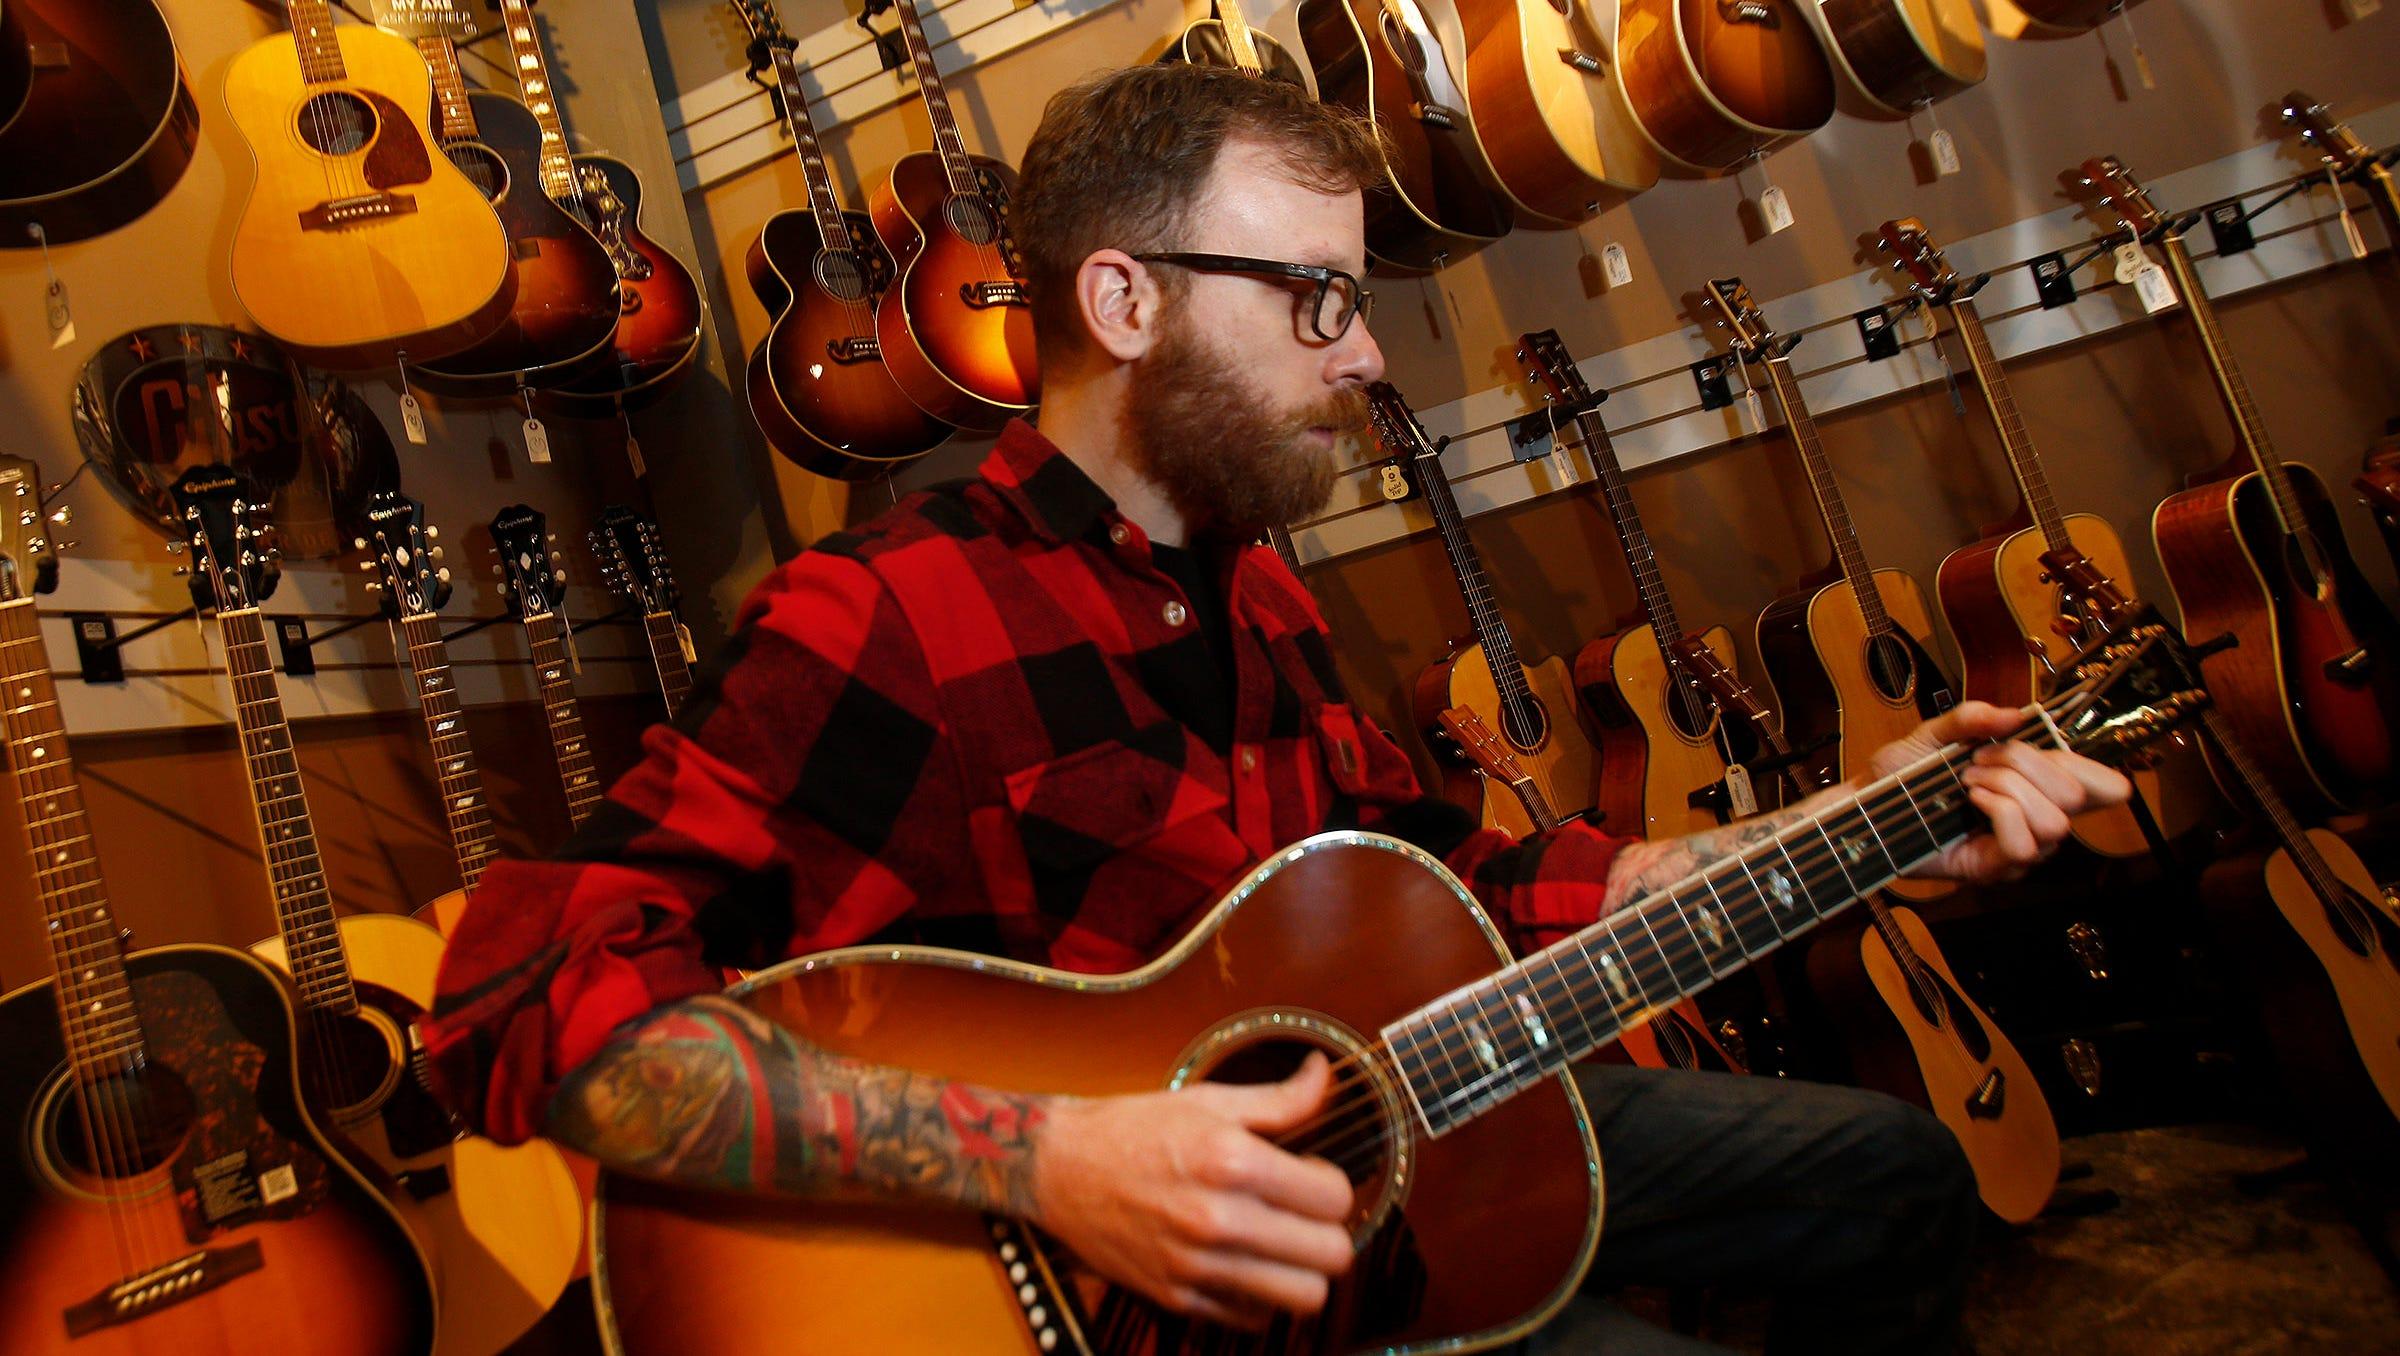 Self-tie Bow tie Guitar Bow tie Acoustic Guitars Electric Guitars